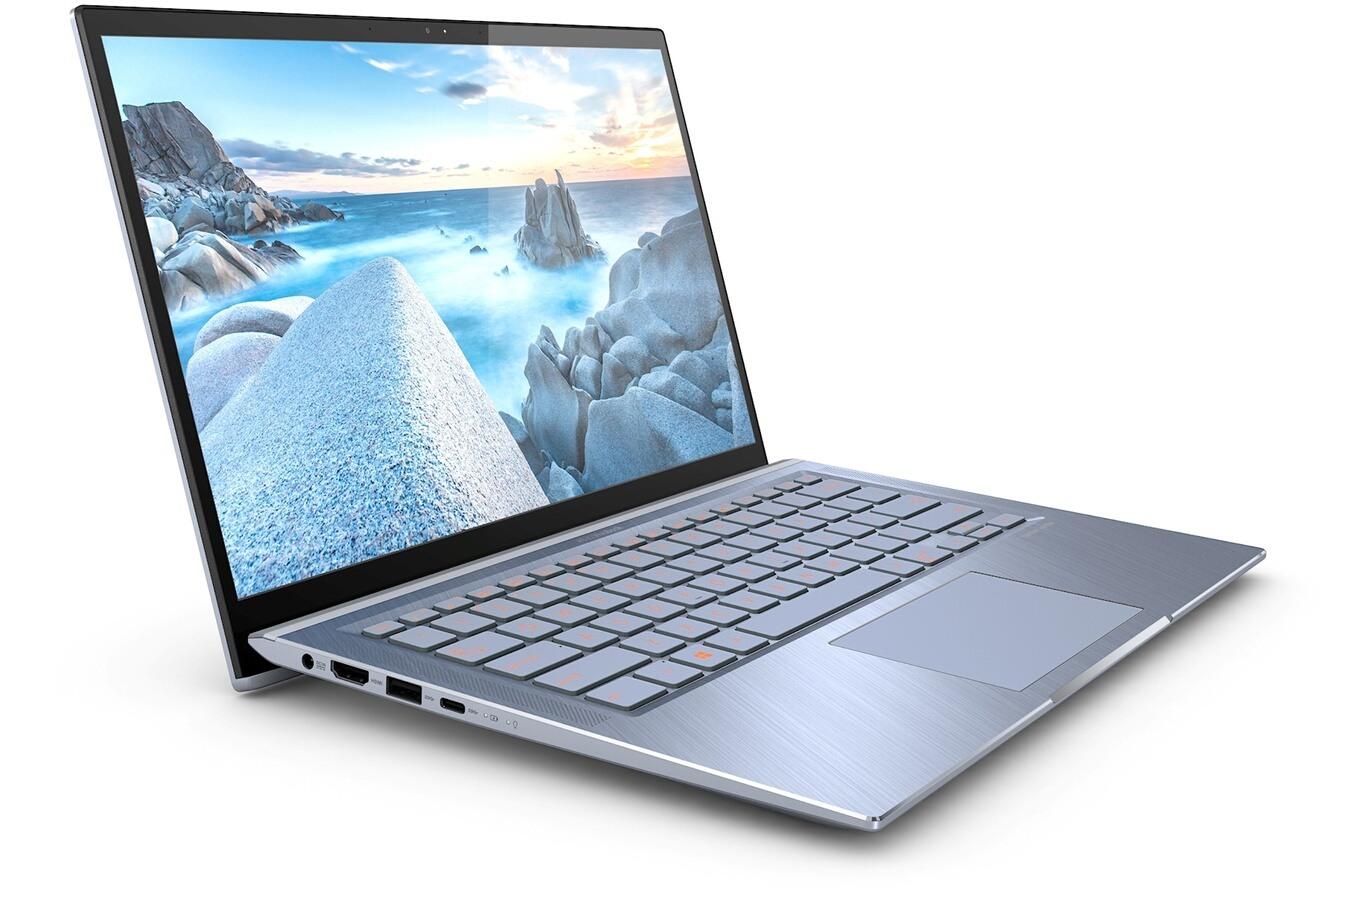 "Asus Zenbook UX431FA-AN002T, ultrabook 14"" réactif (799€)"